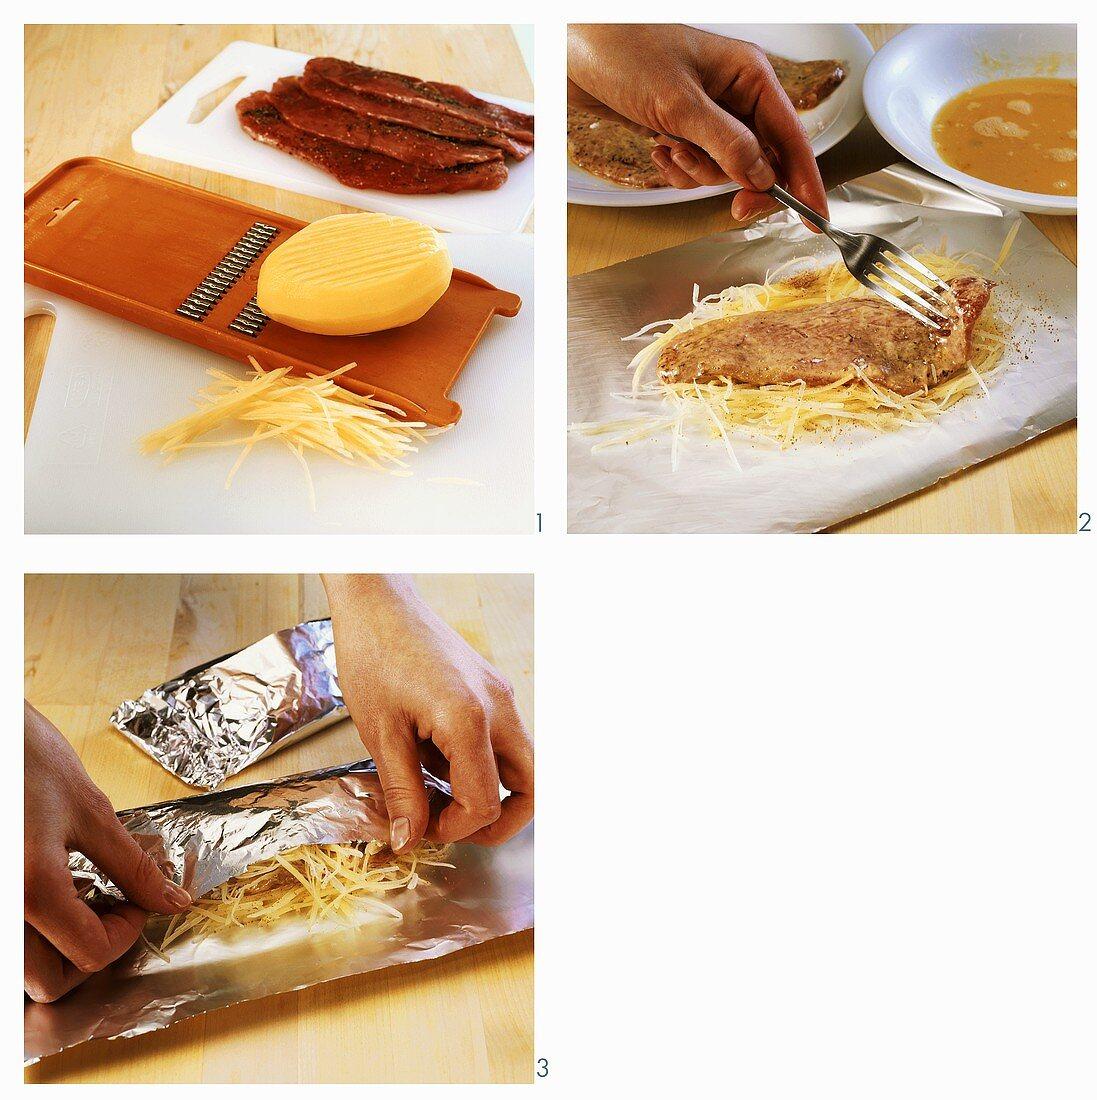 Preparing escalopes with potato crust